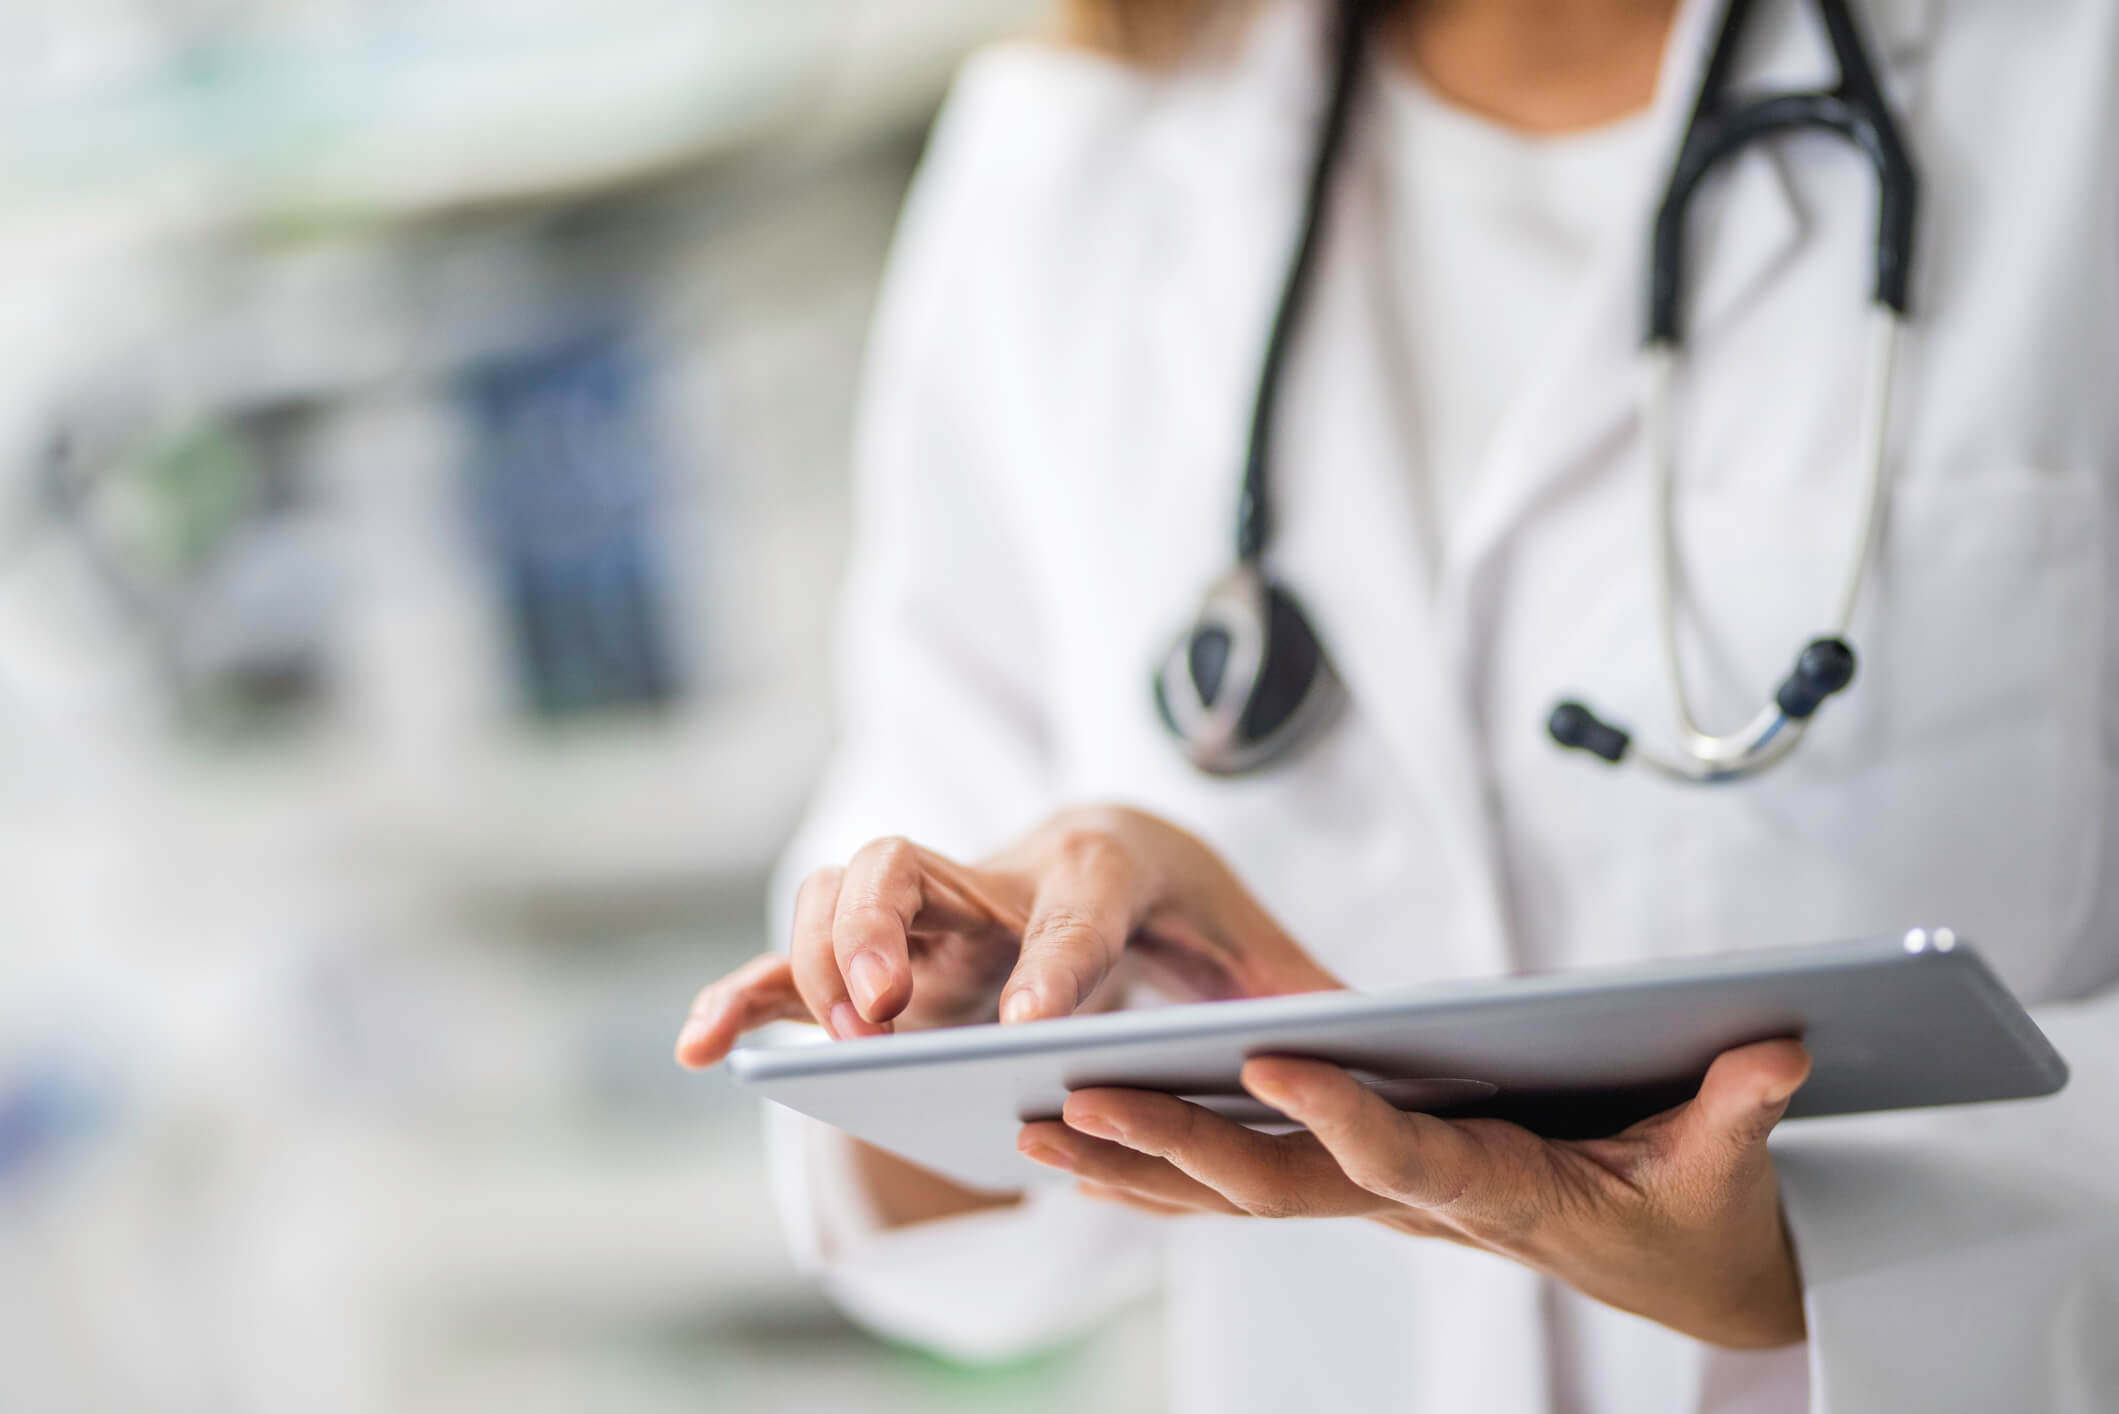 Saúde 4.0 entenda o que muda na forma de atendimento ao paciente